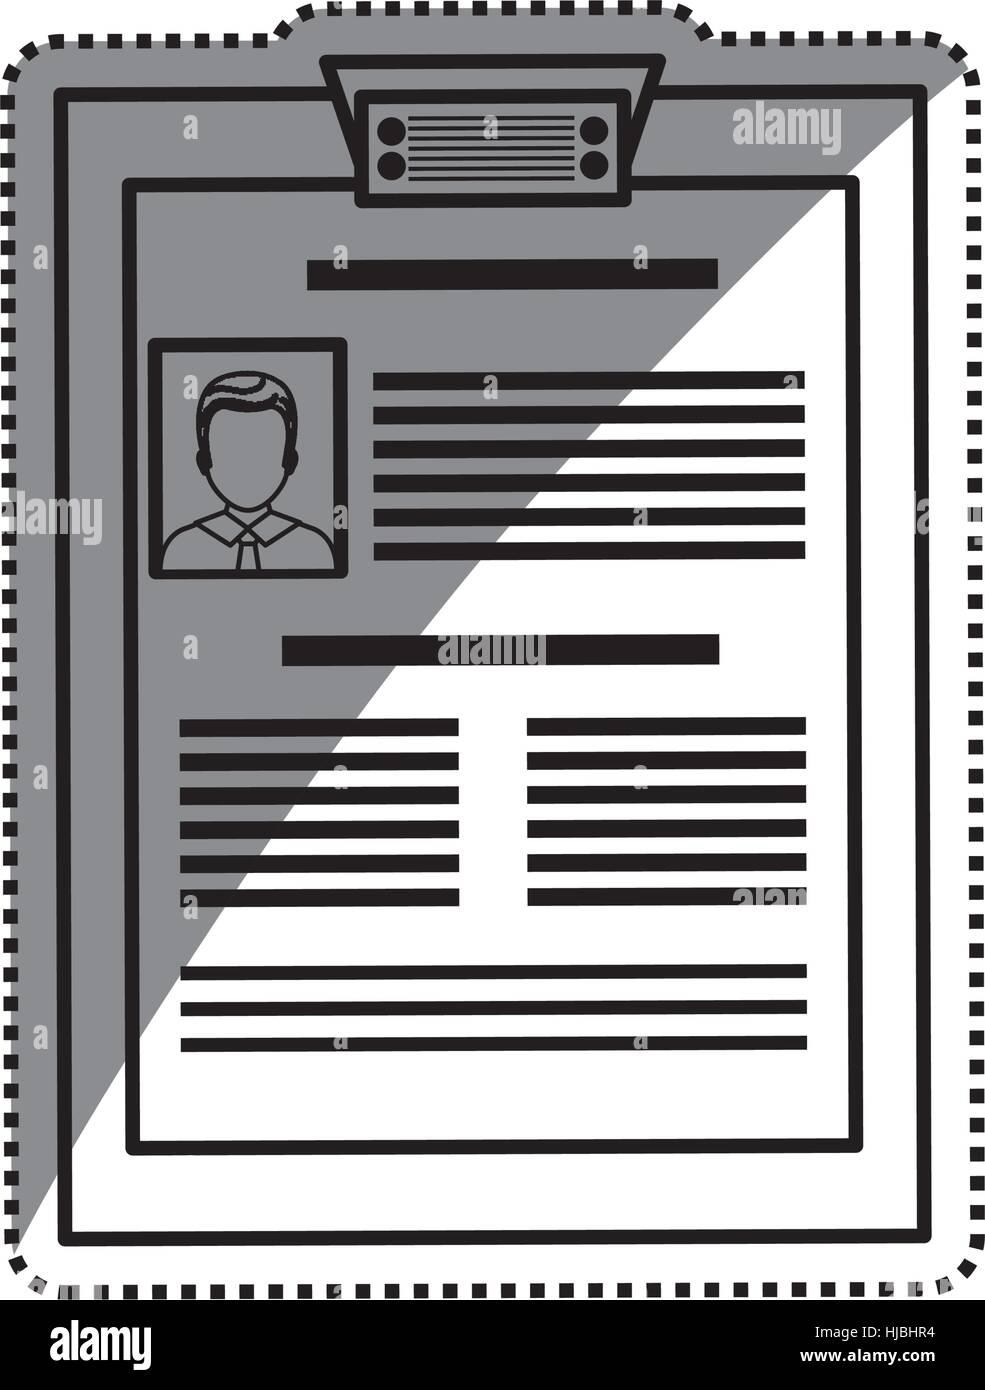 Cv Curriculum Vitae Resume Vector Imágenes De Stock & Cv Curriculum ...